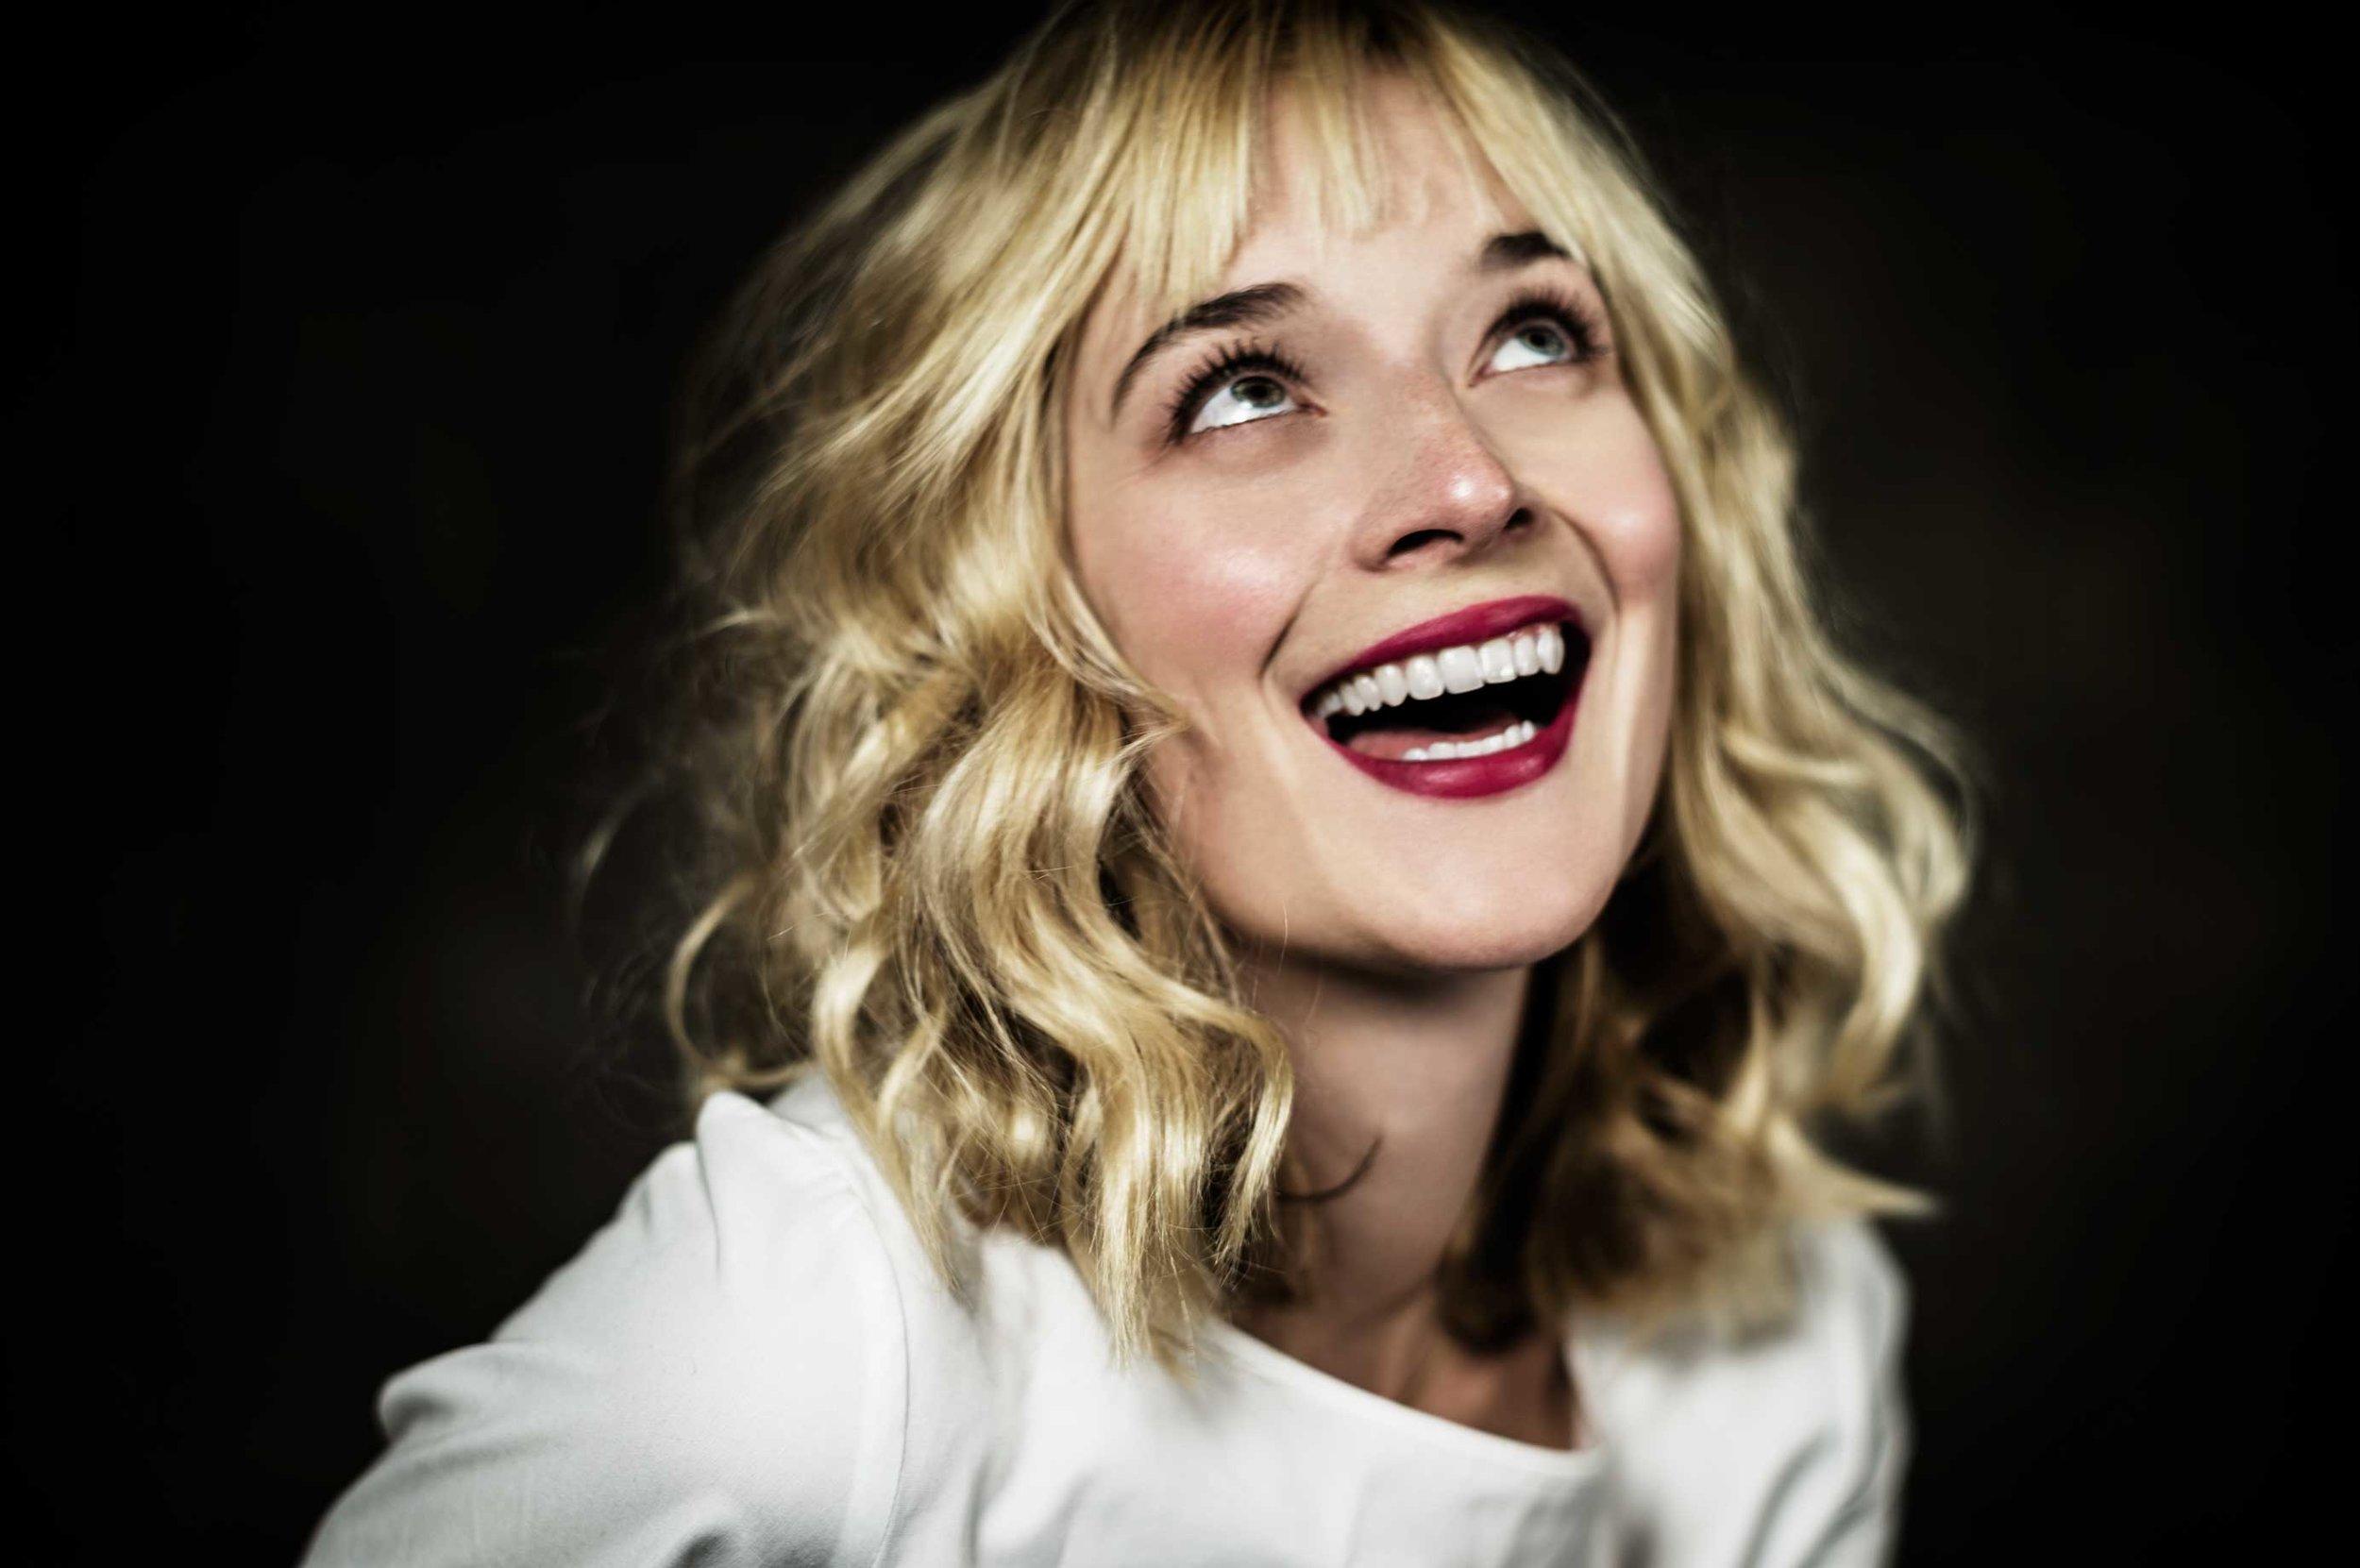 Caitlin-Fitzgerald-Always-Shine-901-1-copy.jpg